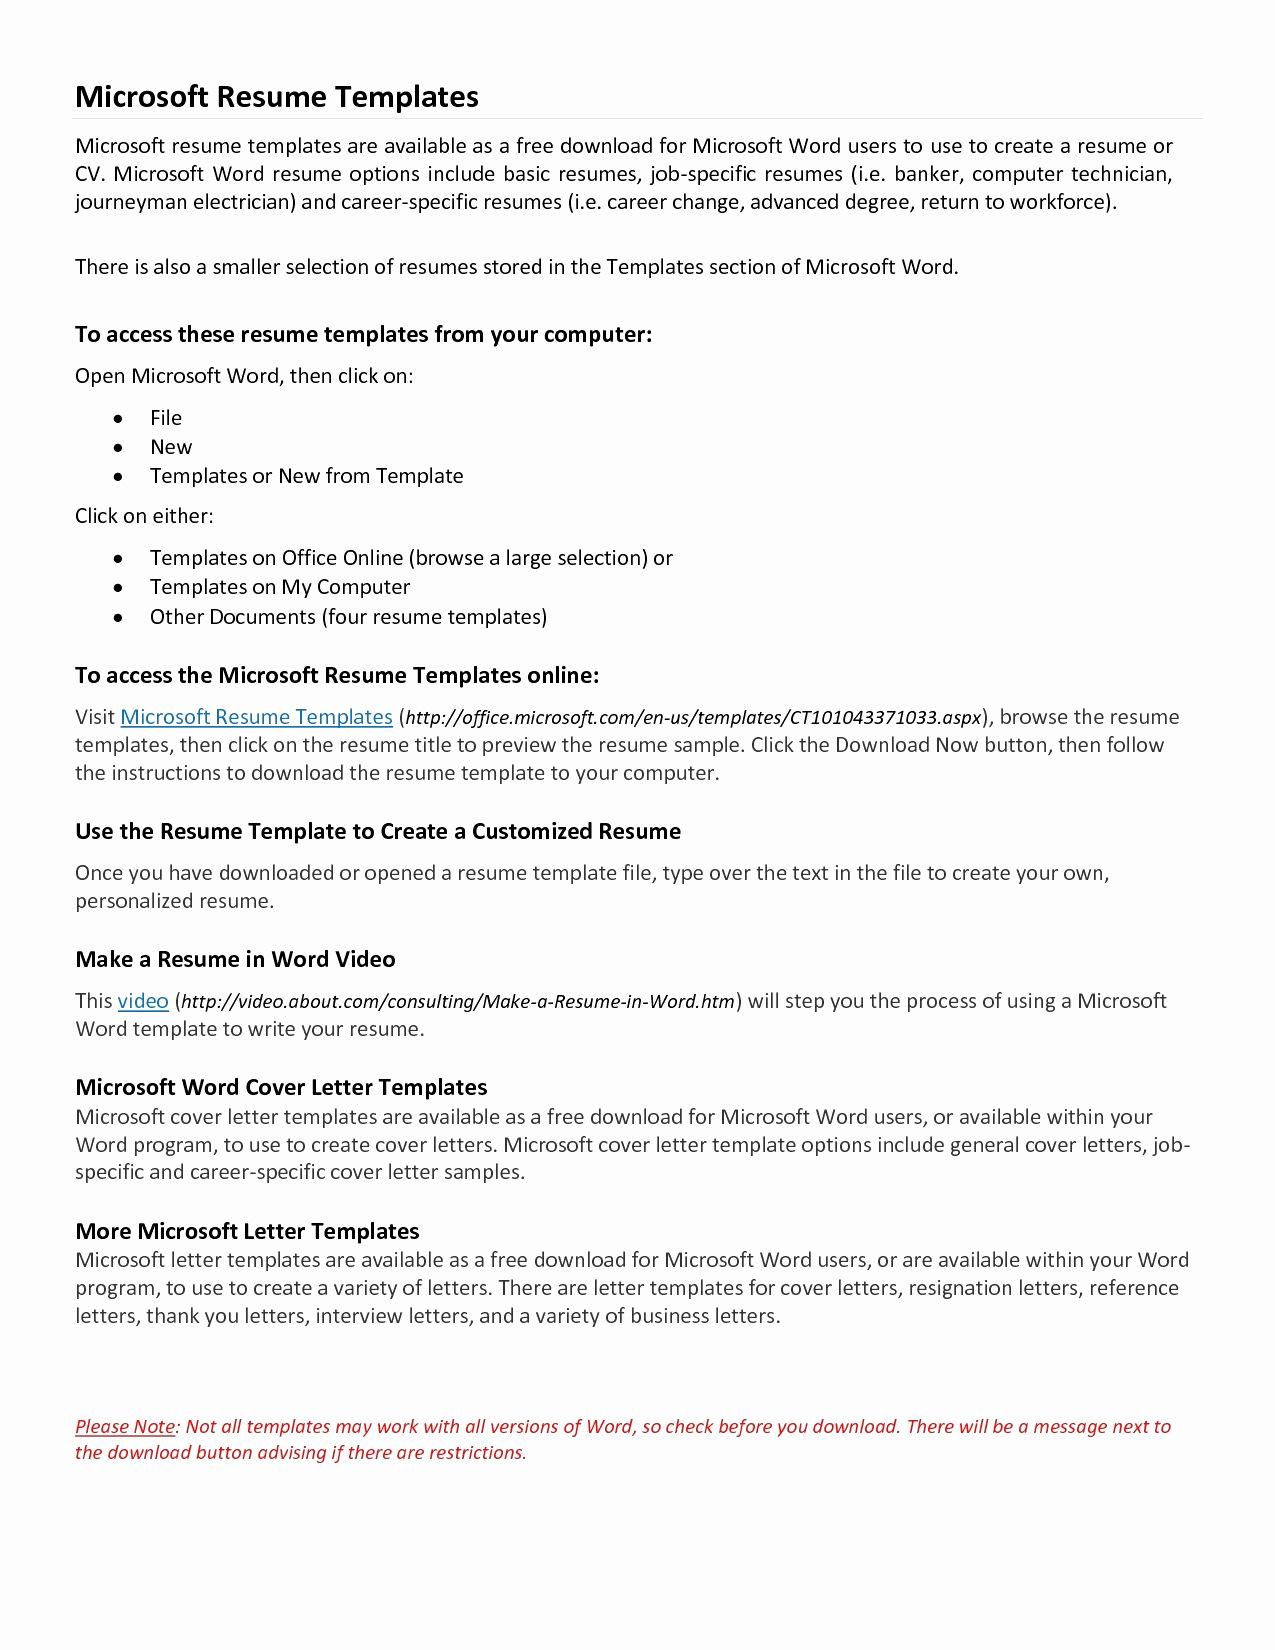 Microsoft Word Resume Cover Letter Template - Free Microsoft Resume Templates New Microsoft Word Resume Sample